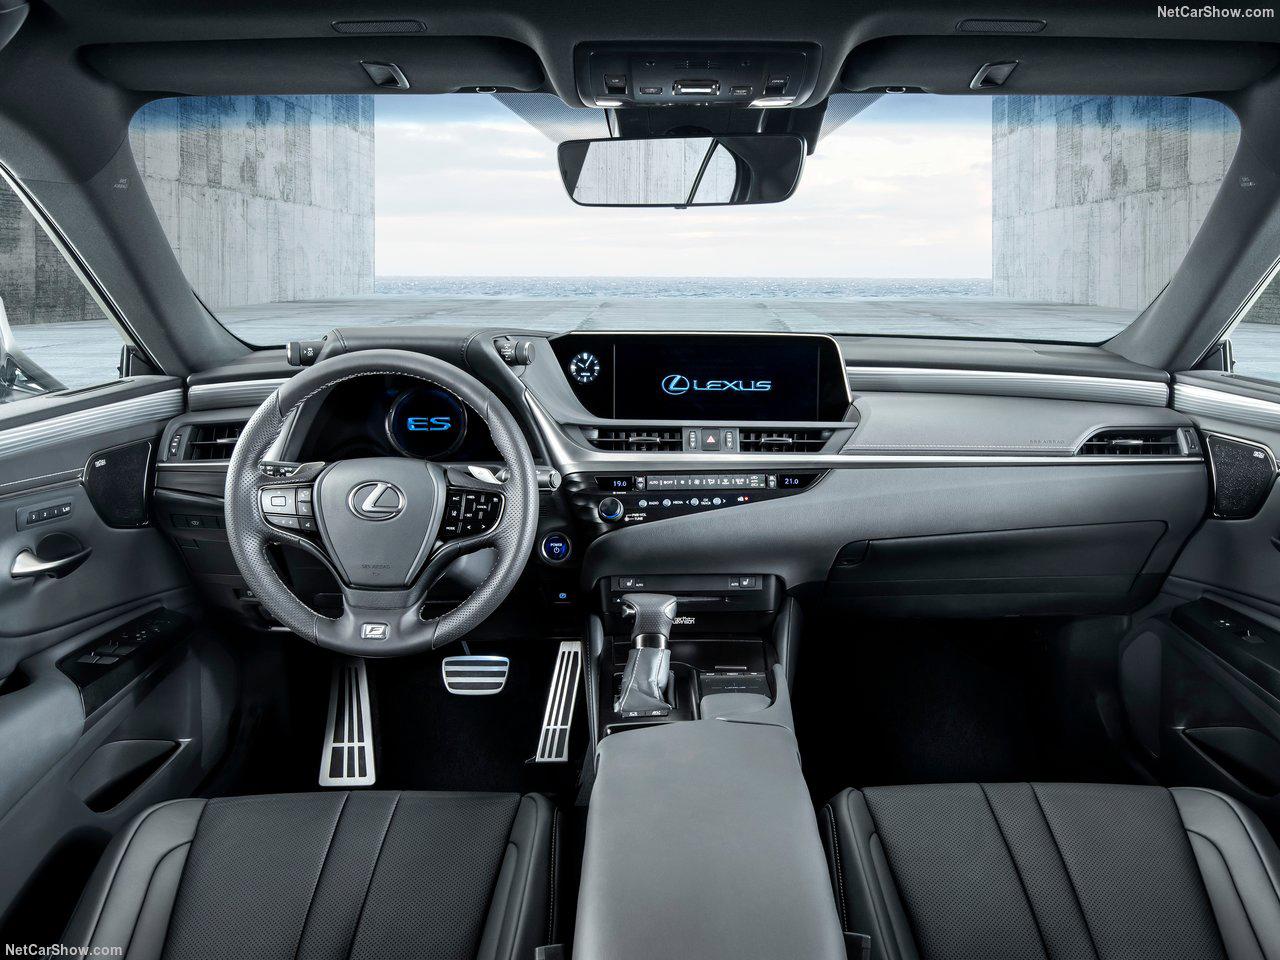 LexusES43_20180830185115acf.jpg